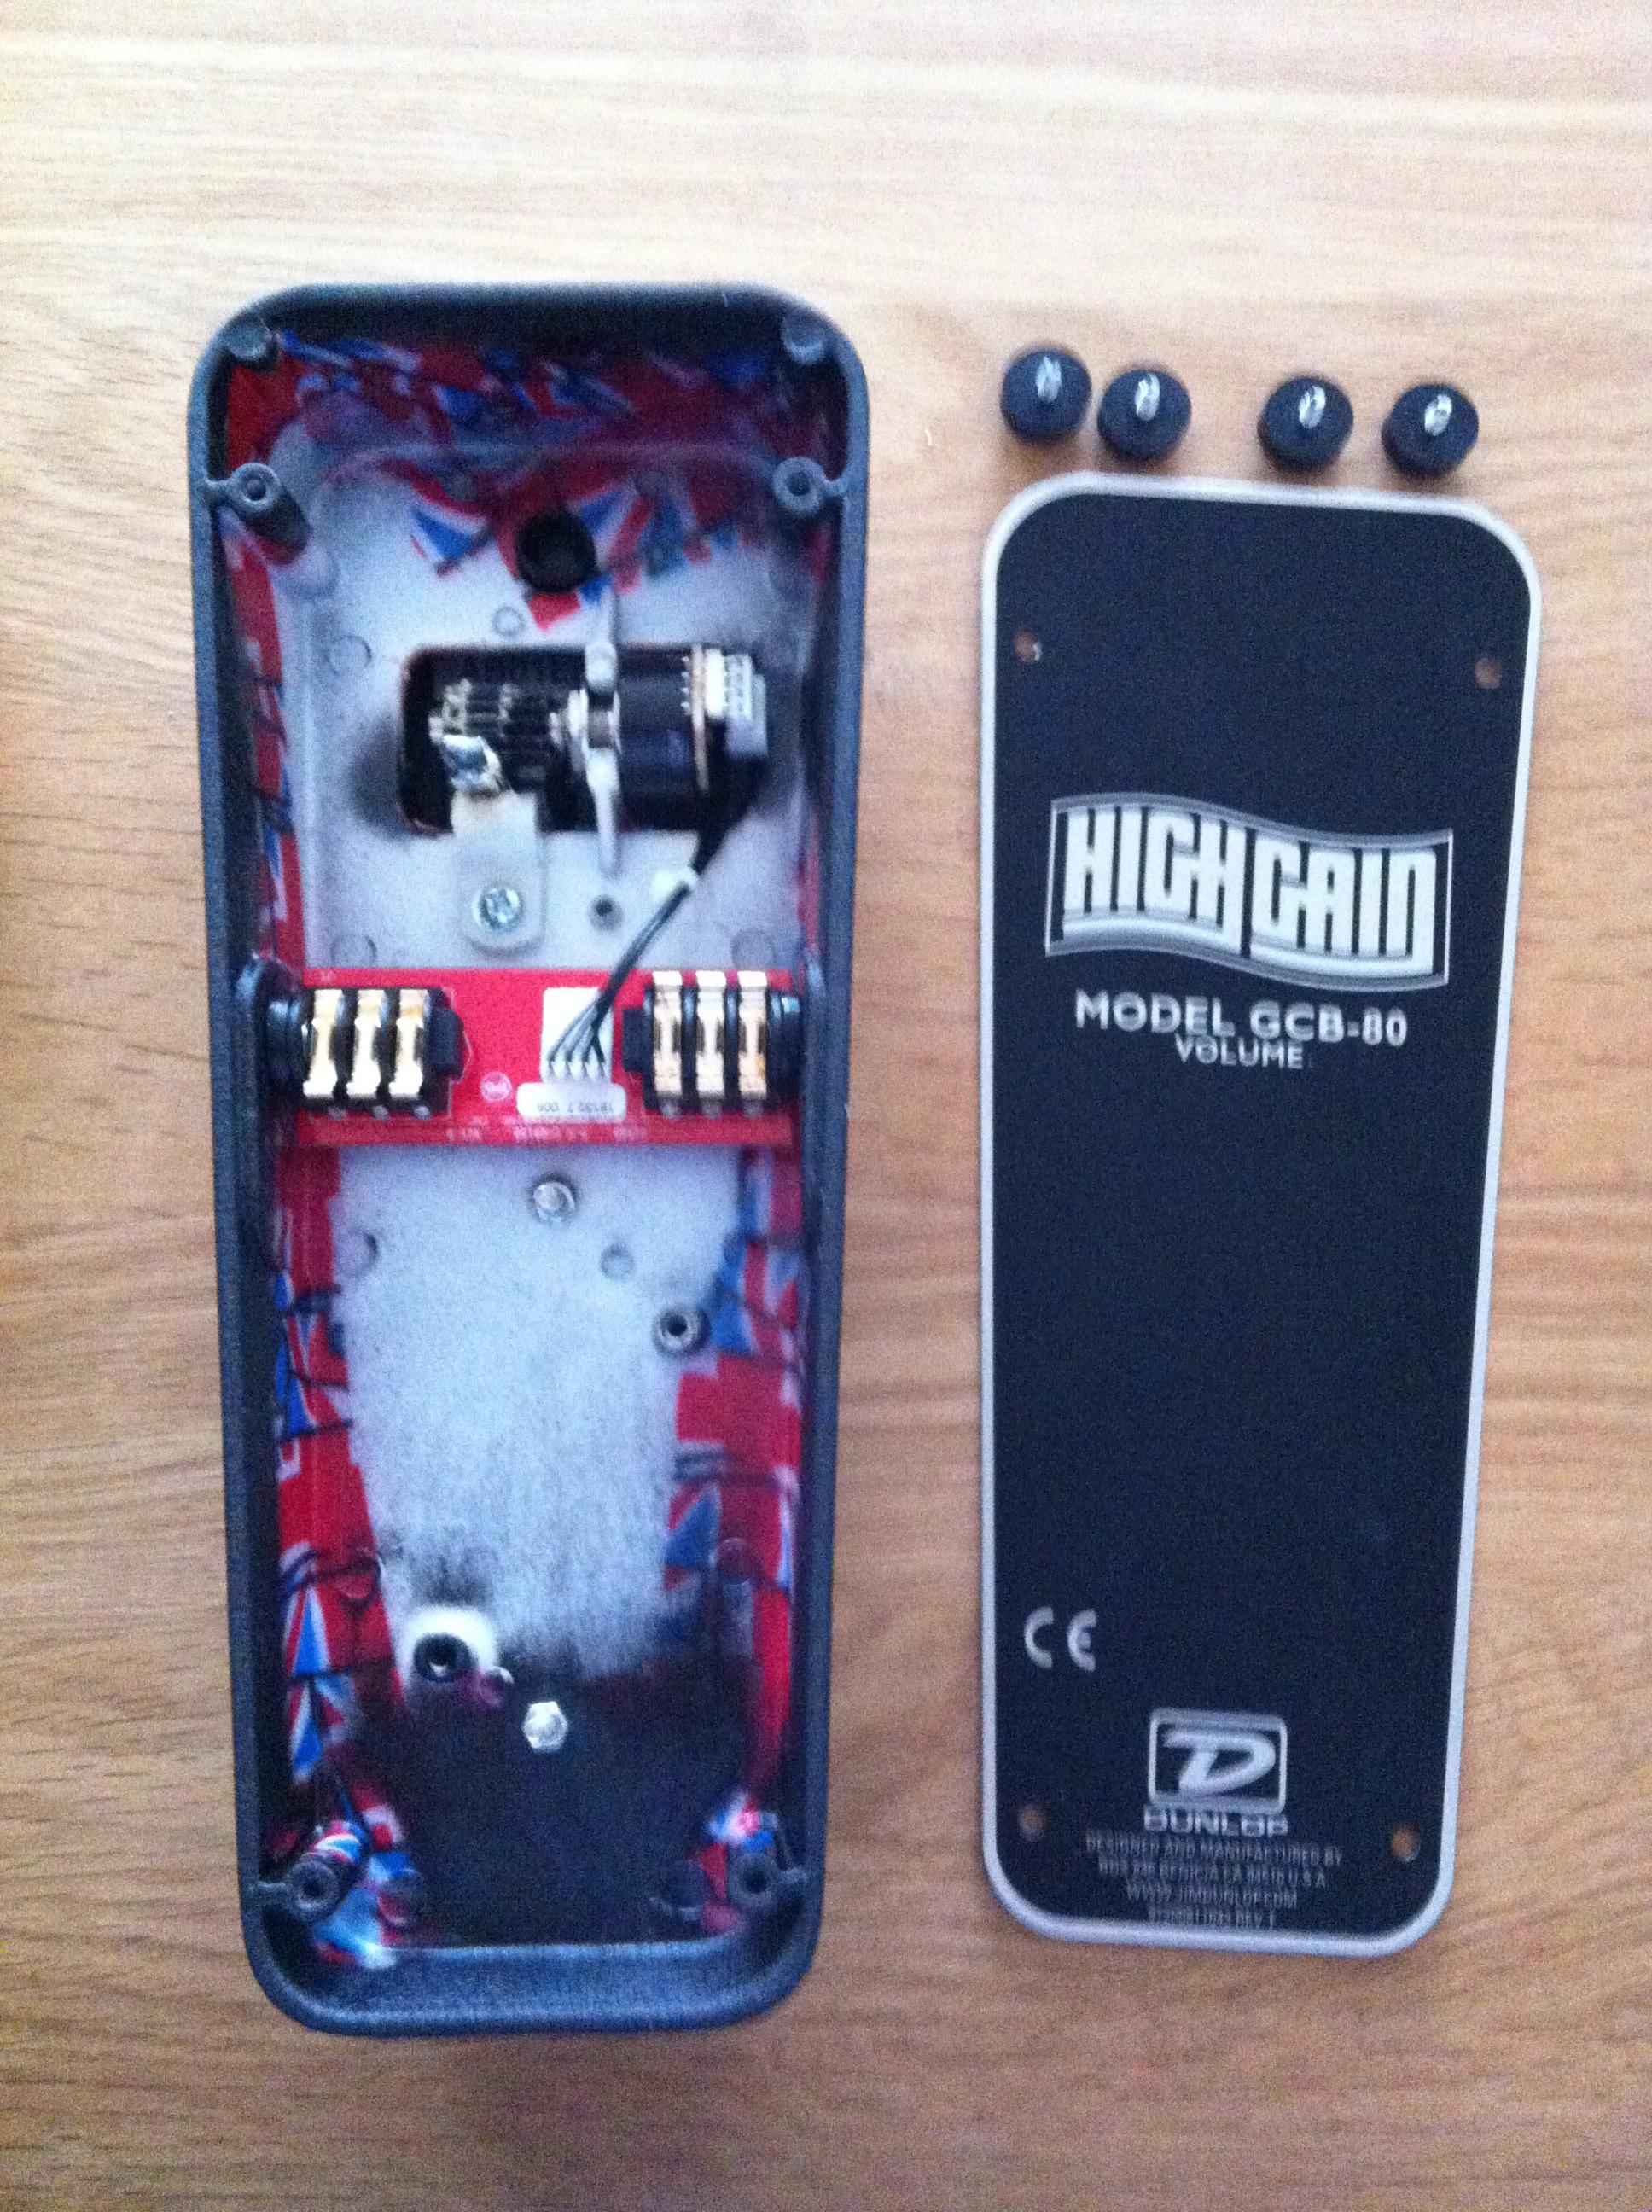 dunlop gcb80 high gain volume pedal image 489155 audiofanzine. Black Bedroom Furniture Sets. Home Design Ideas